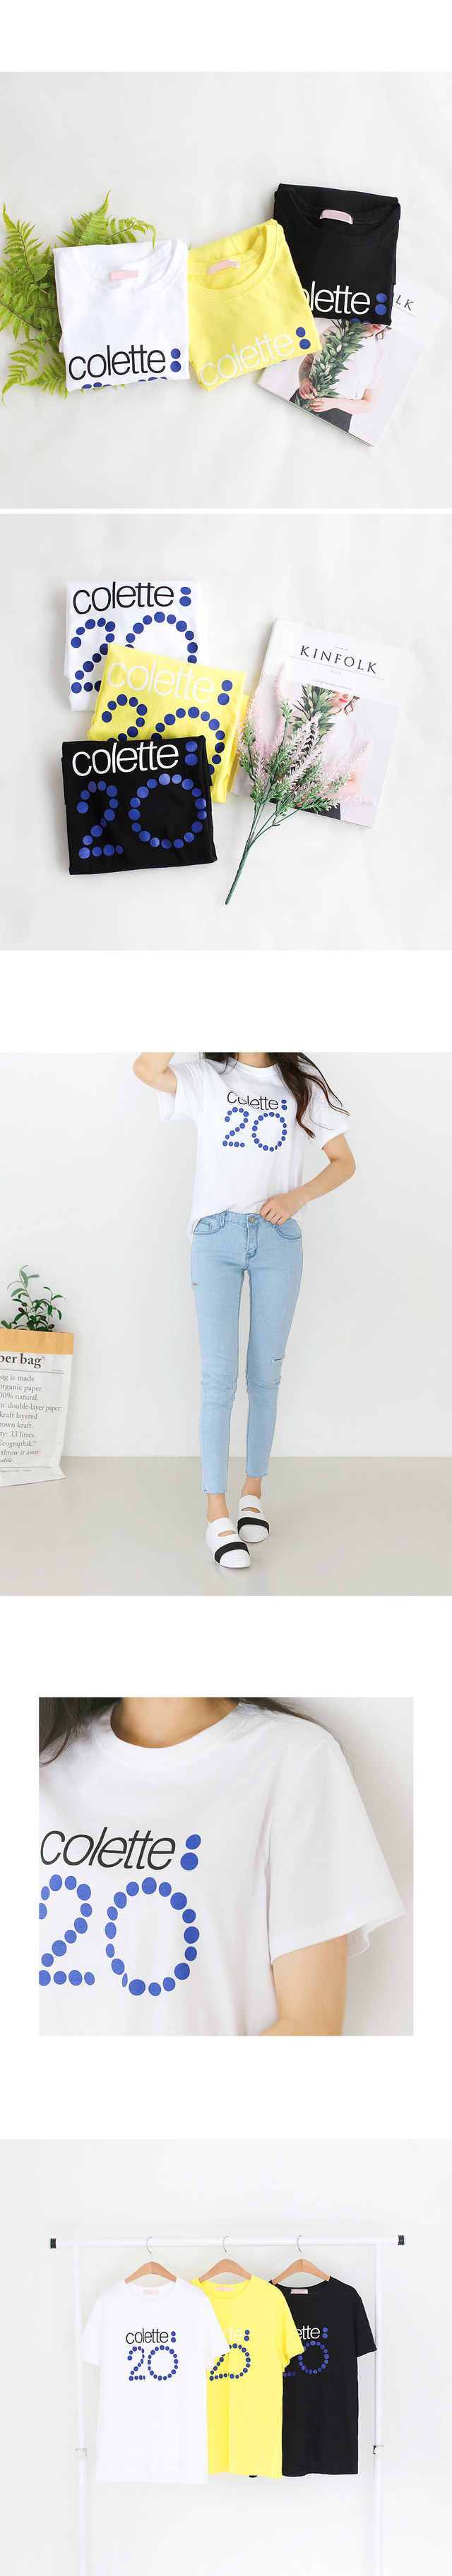 Twenties T-shirt